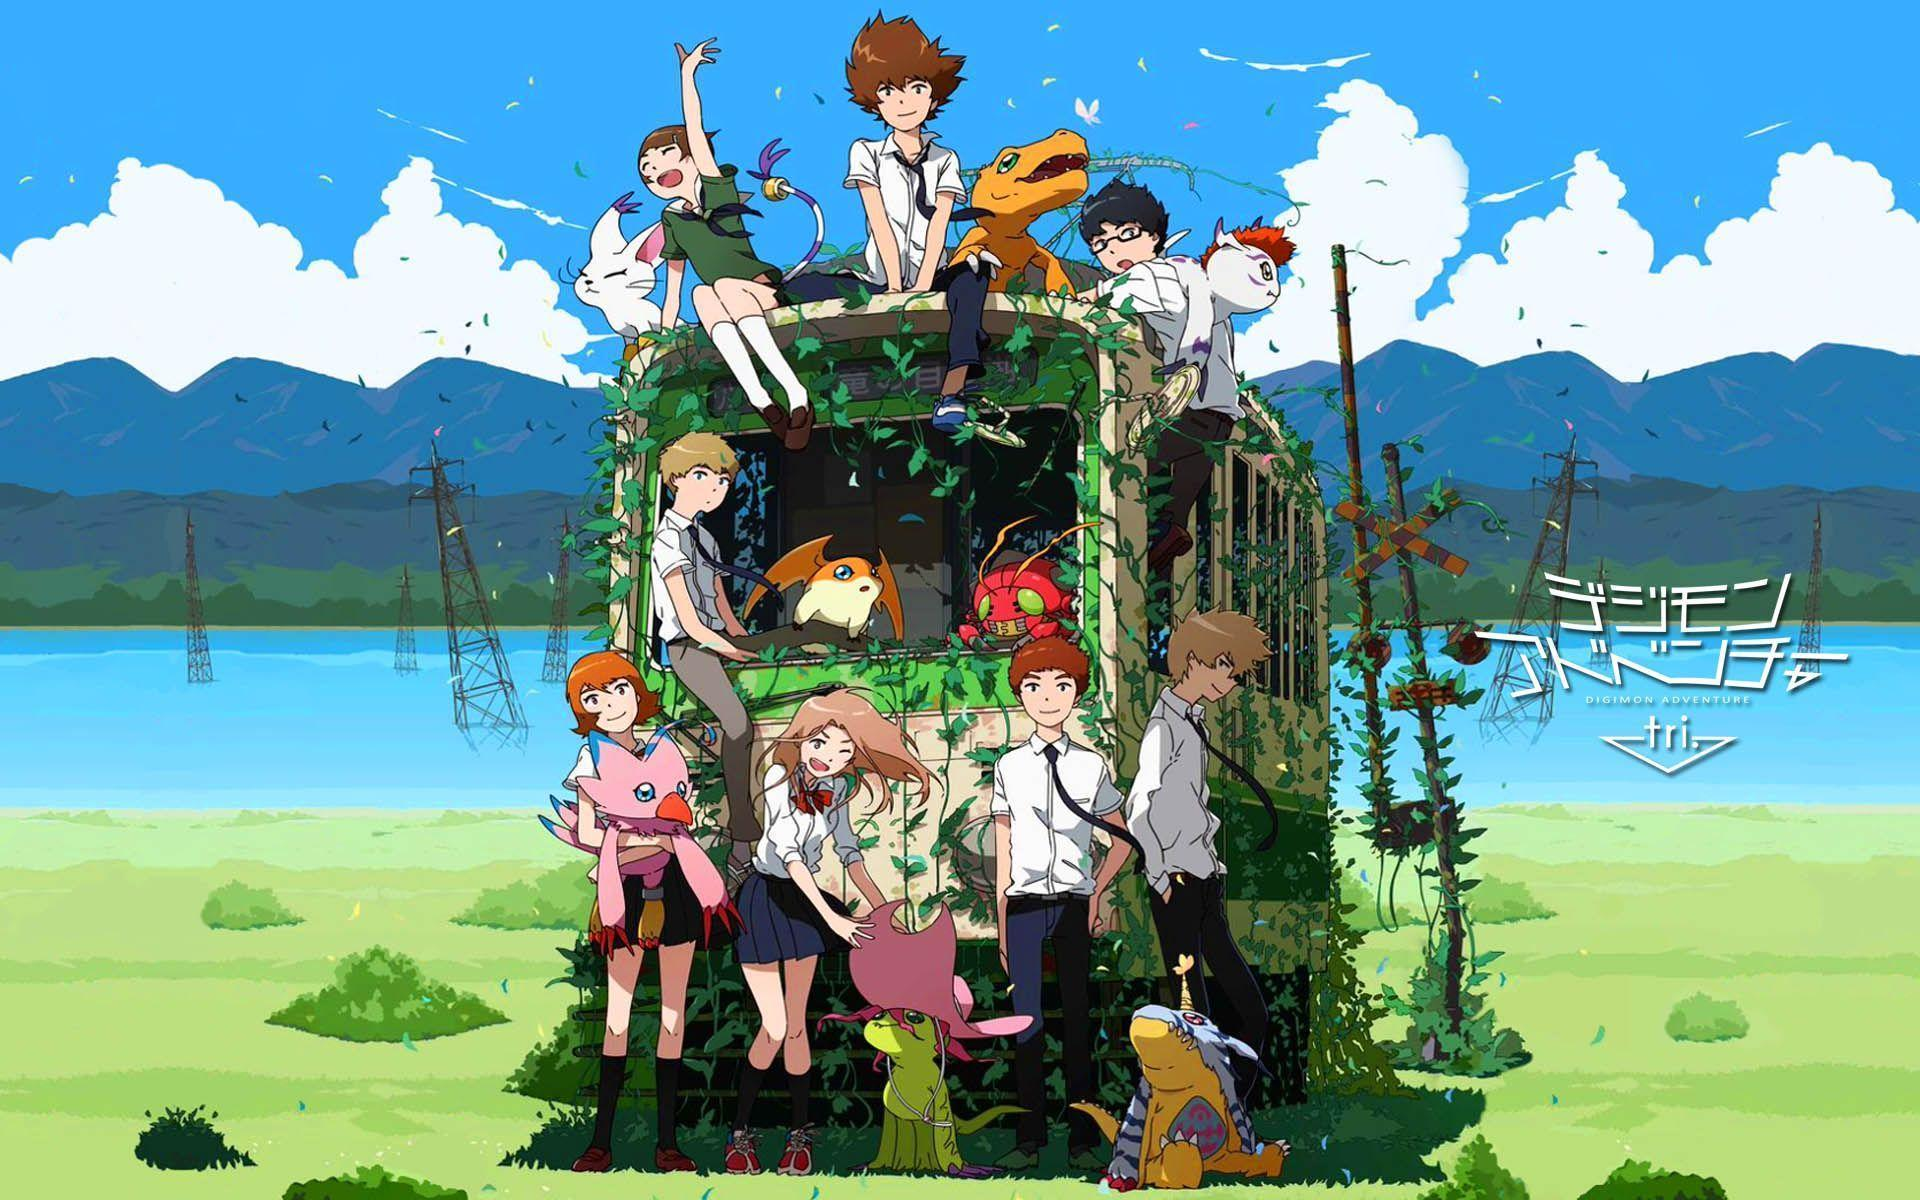 Digimon Adventure Wallpapers - Top Free